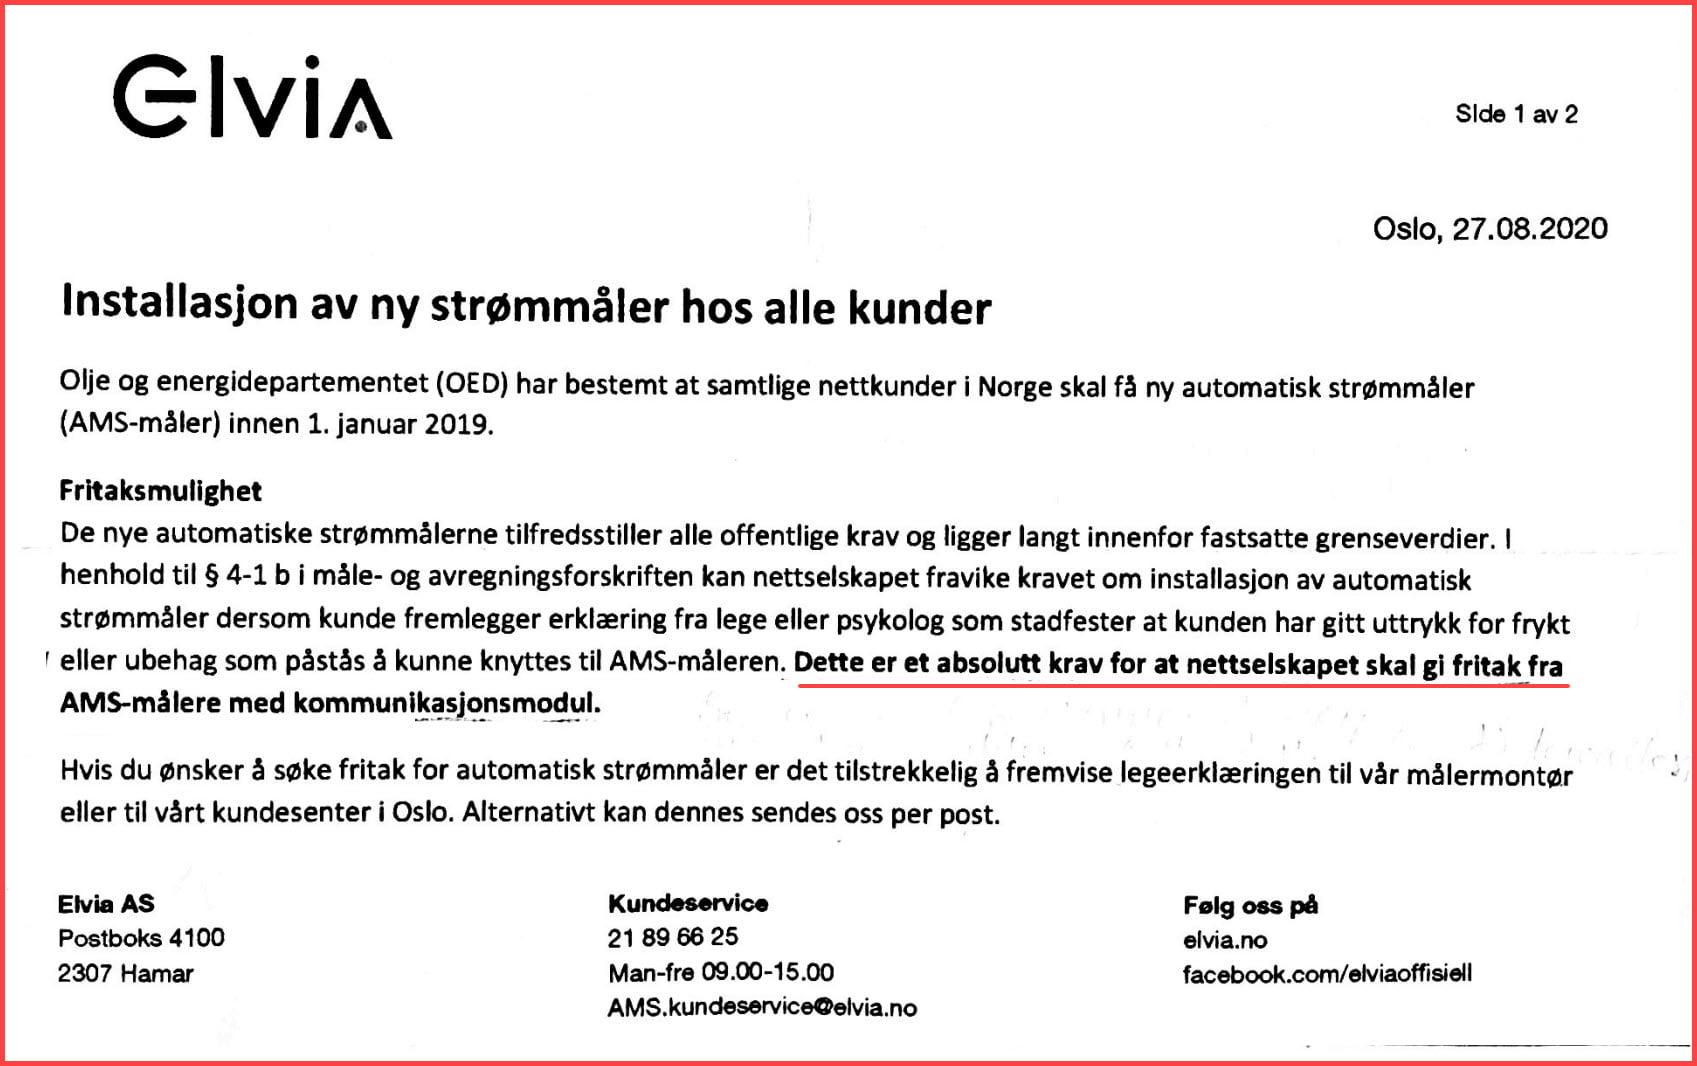 Elvia sitt absolutte krav om legeattest